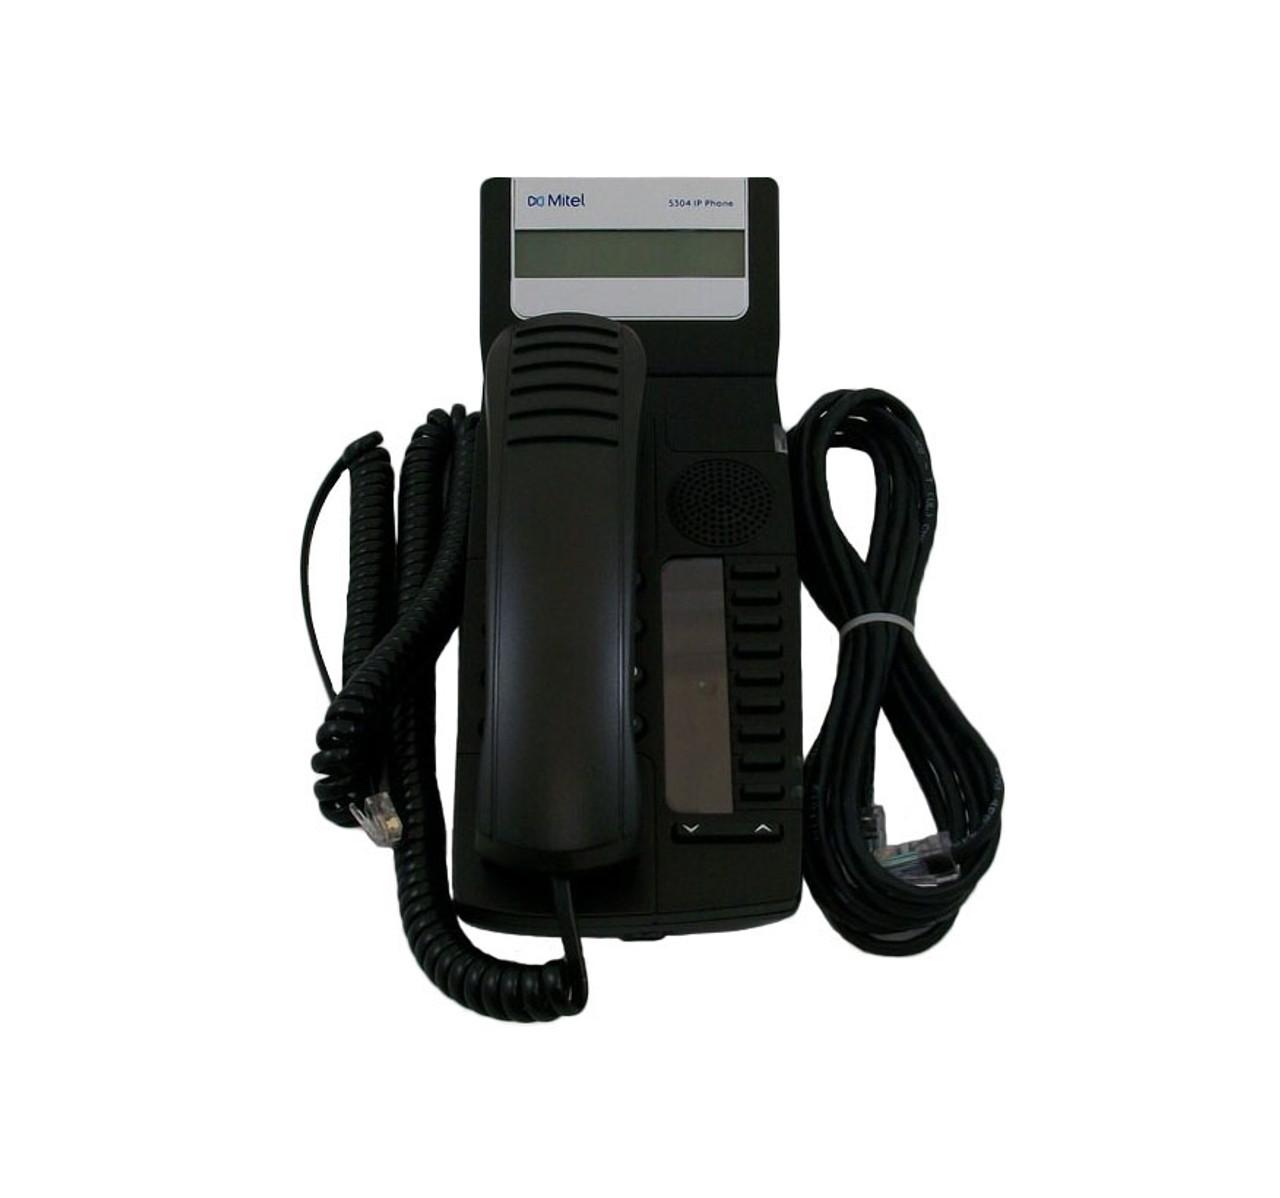 Mitel 5304 2 Line IP Phone 51011571 Rev 5.7